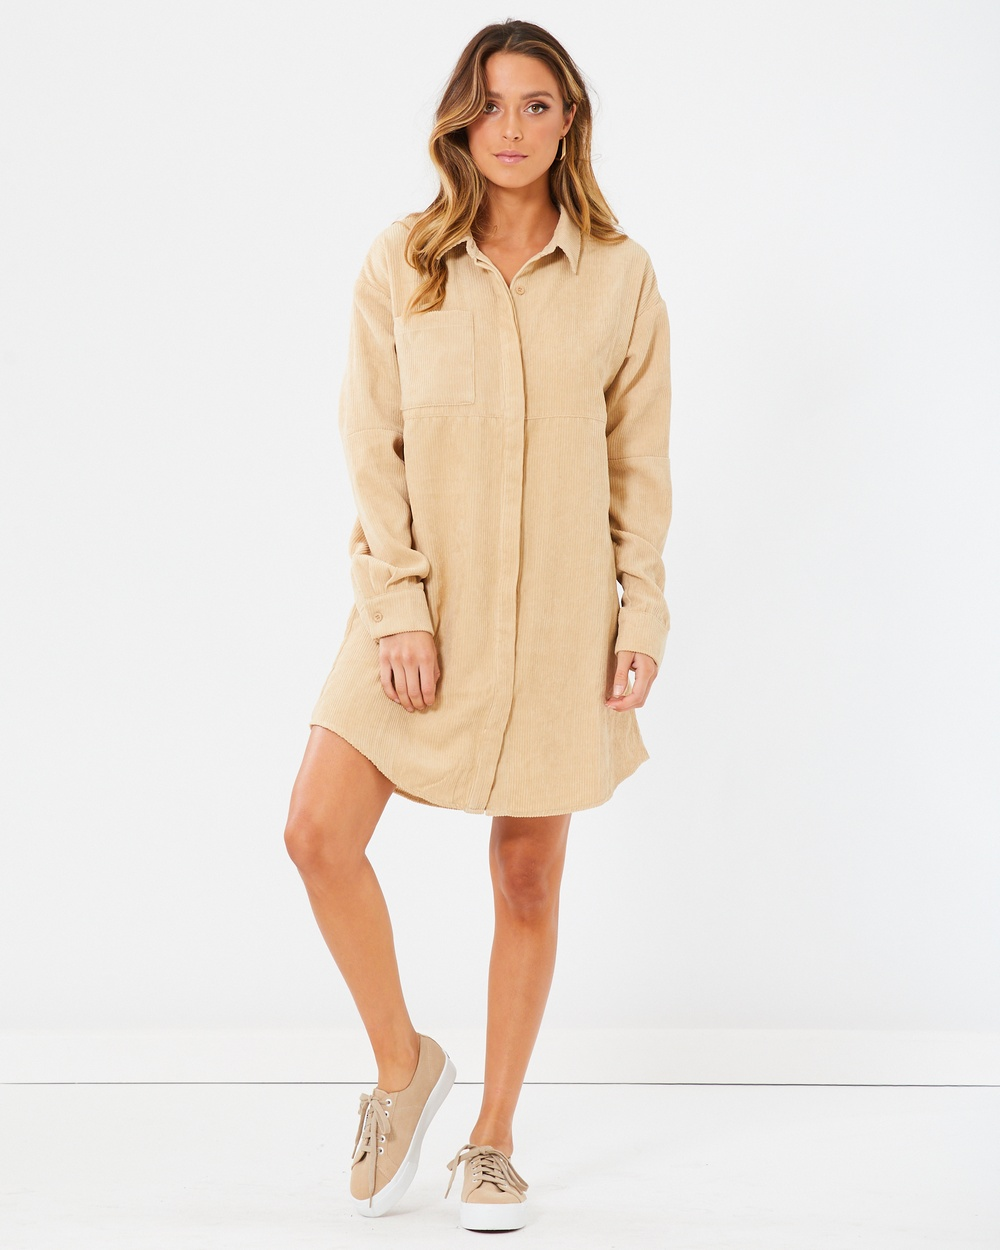 Calli Brenda Dress Dresses Beige Brenda Dress